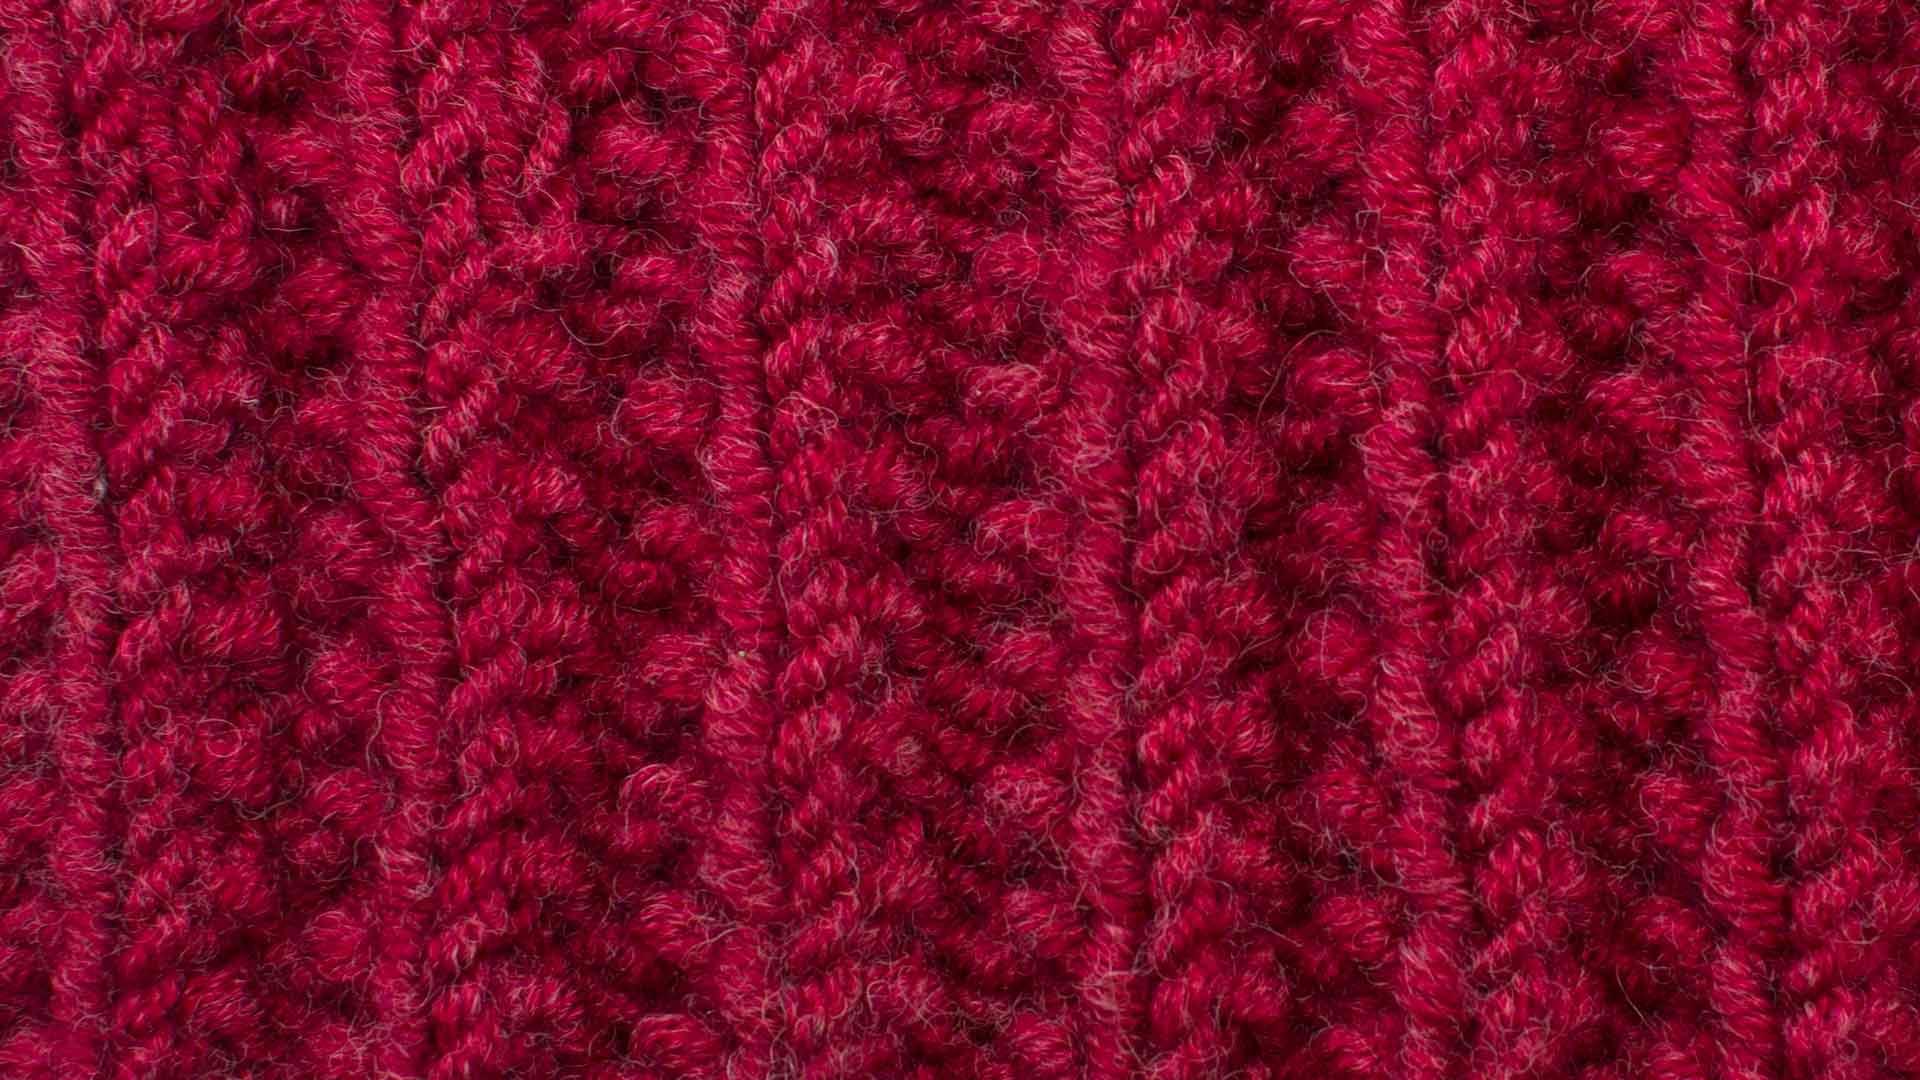 knitting stitches the mistake rib stitch :: knitting stitch #529 dijrjse